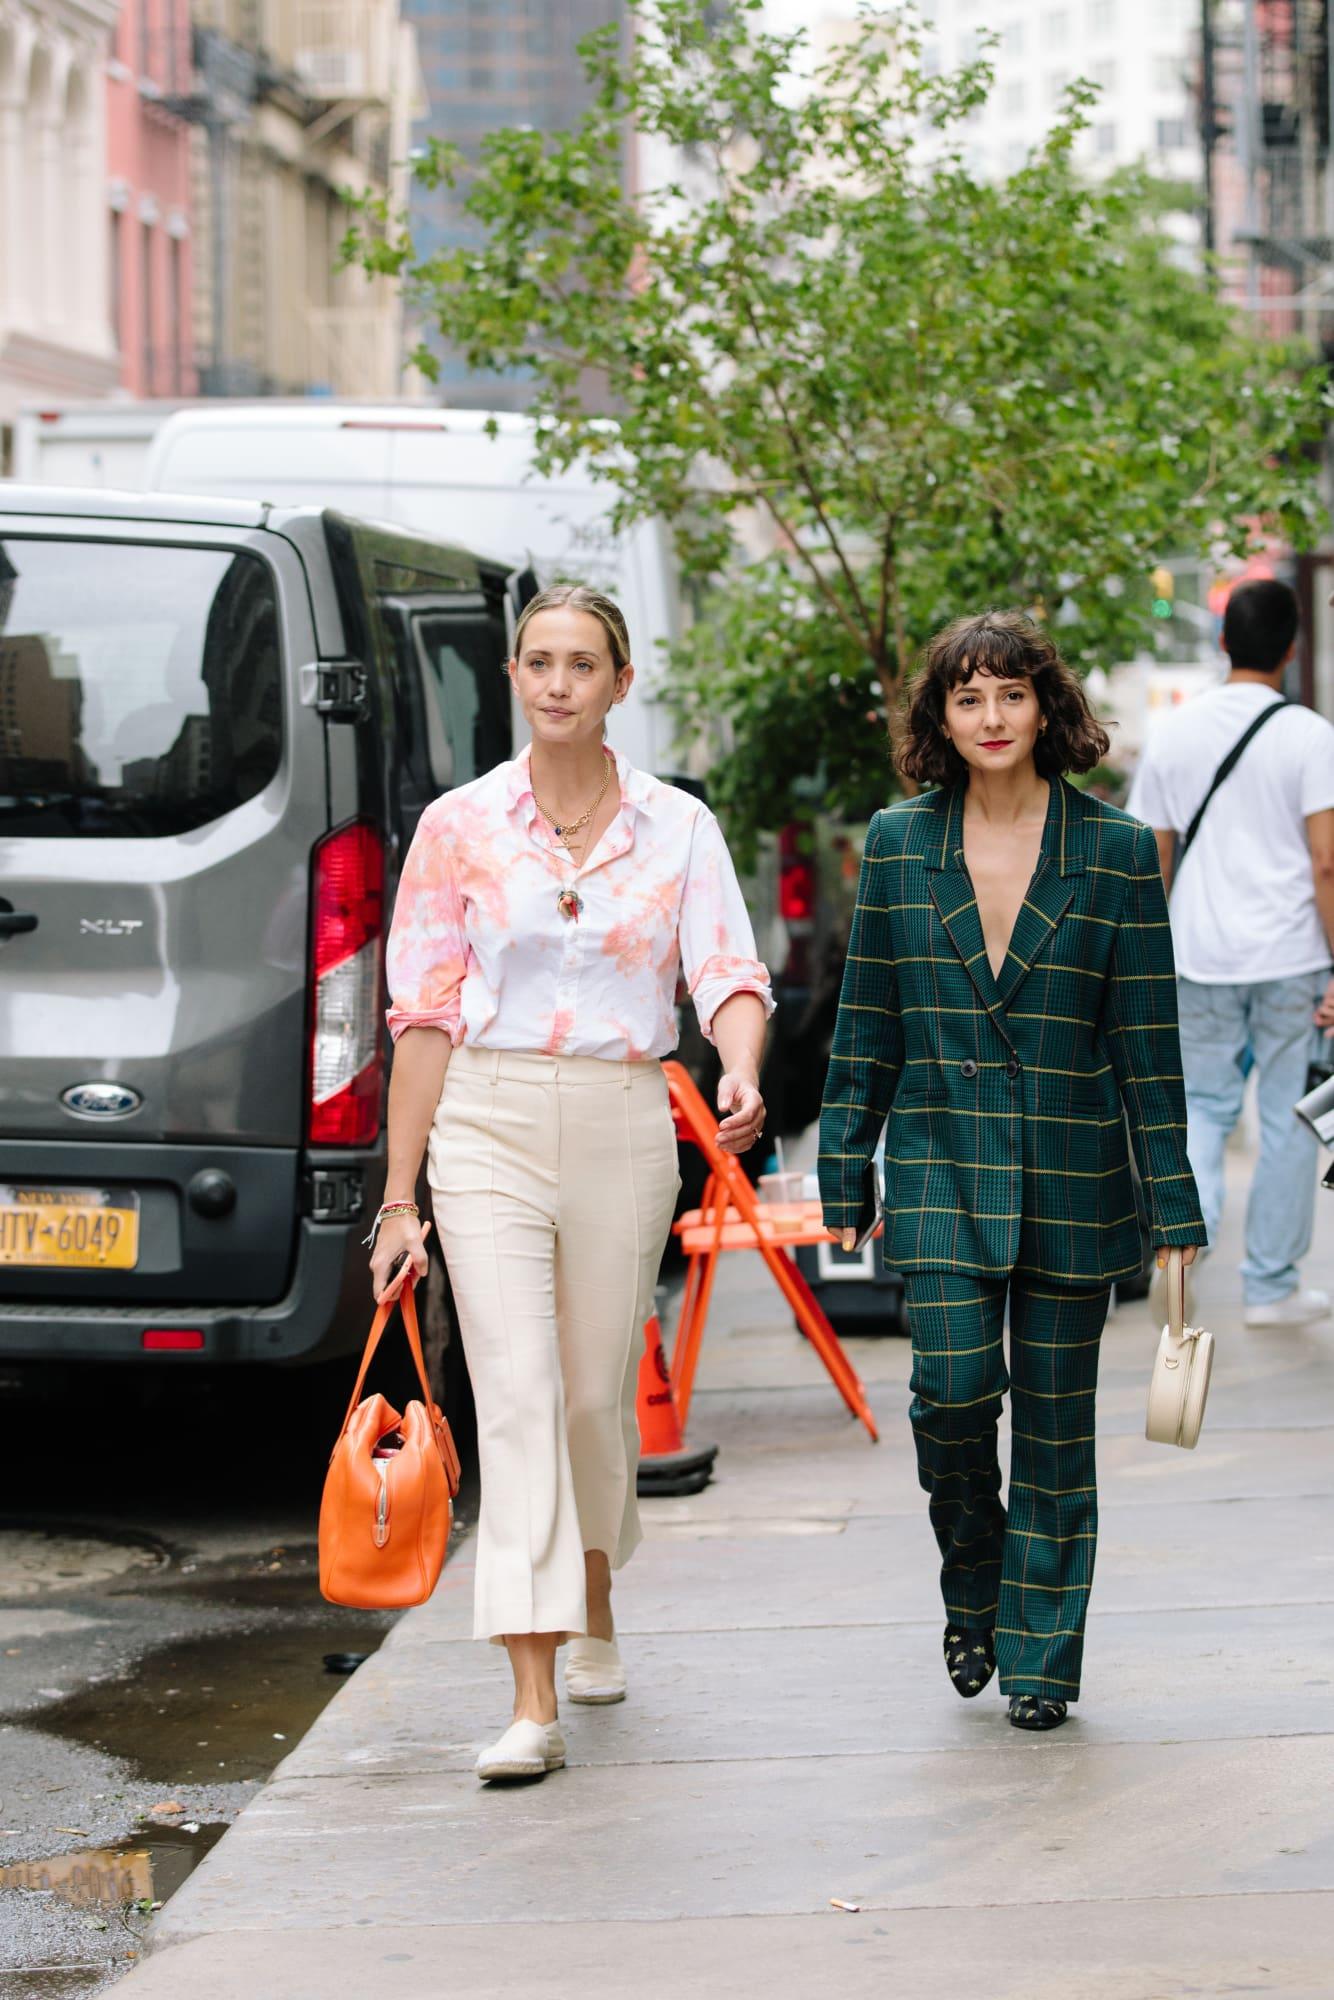 new-york-fashion-week-street-style-spring-2019-day-2-12.jpg